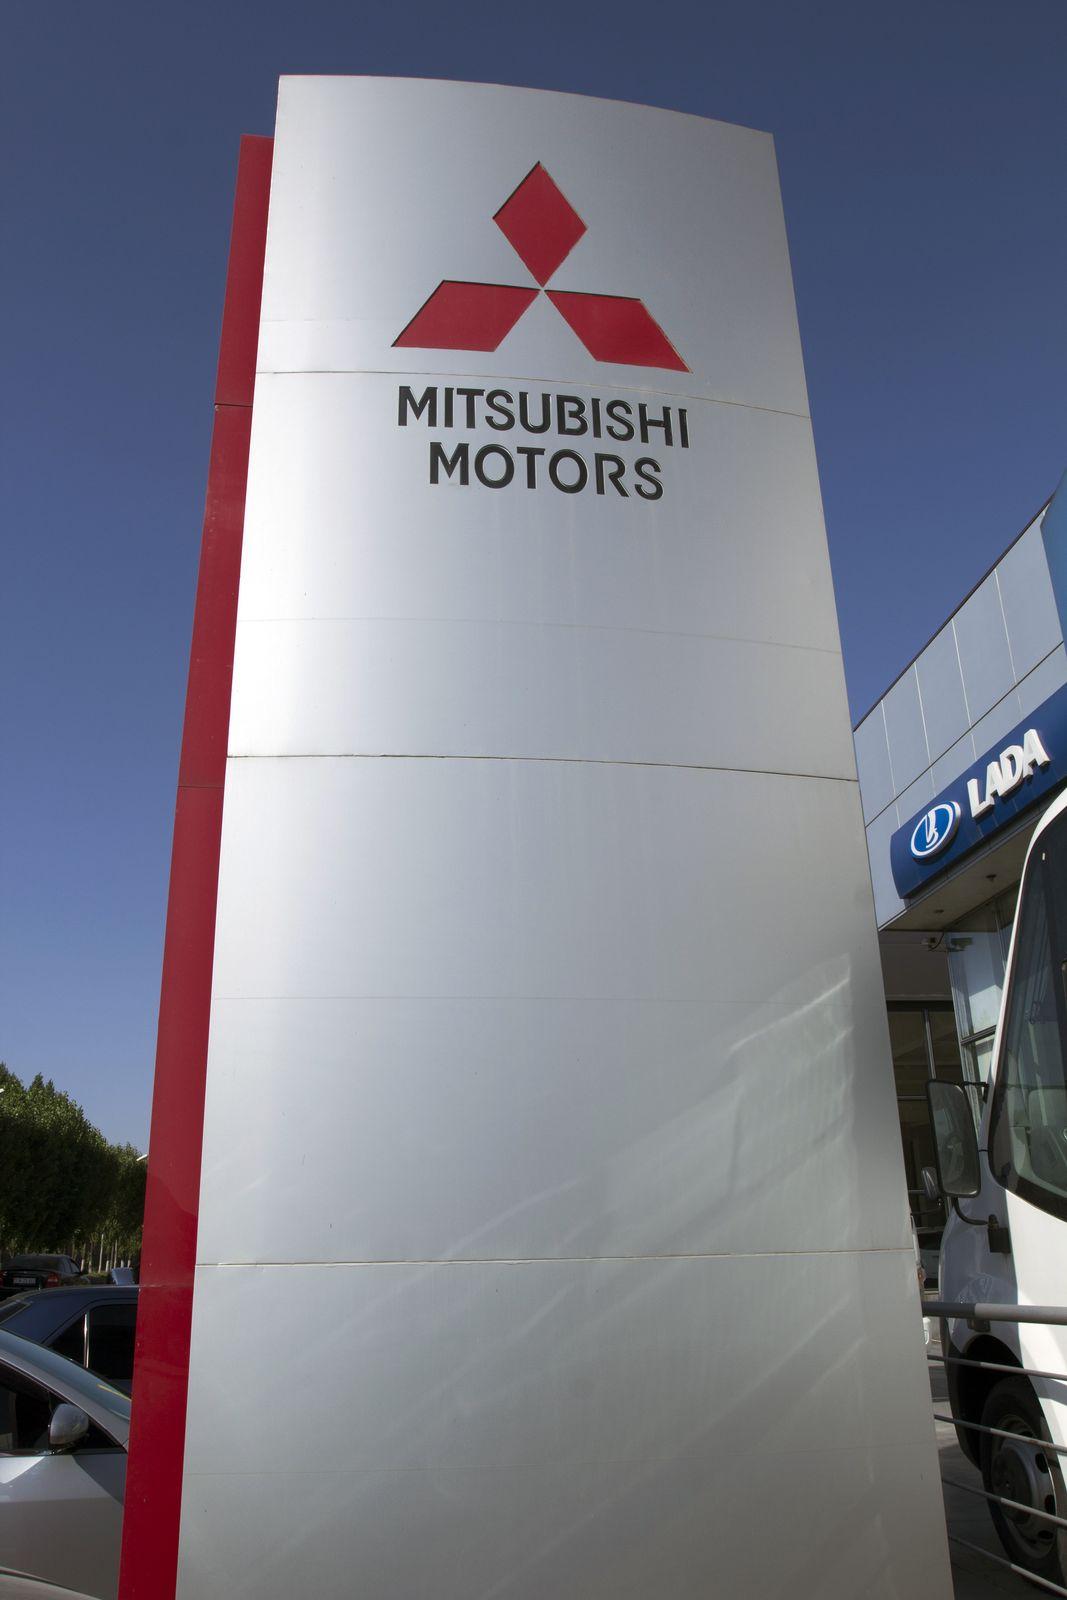 Mitsubishi Pylon Sign